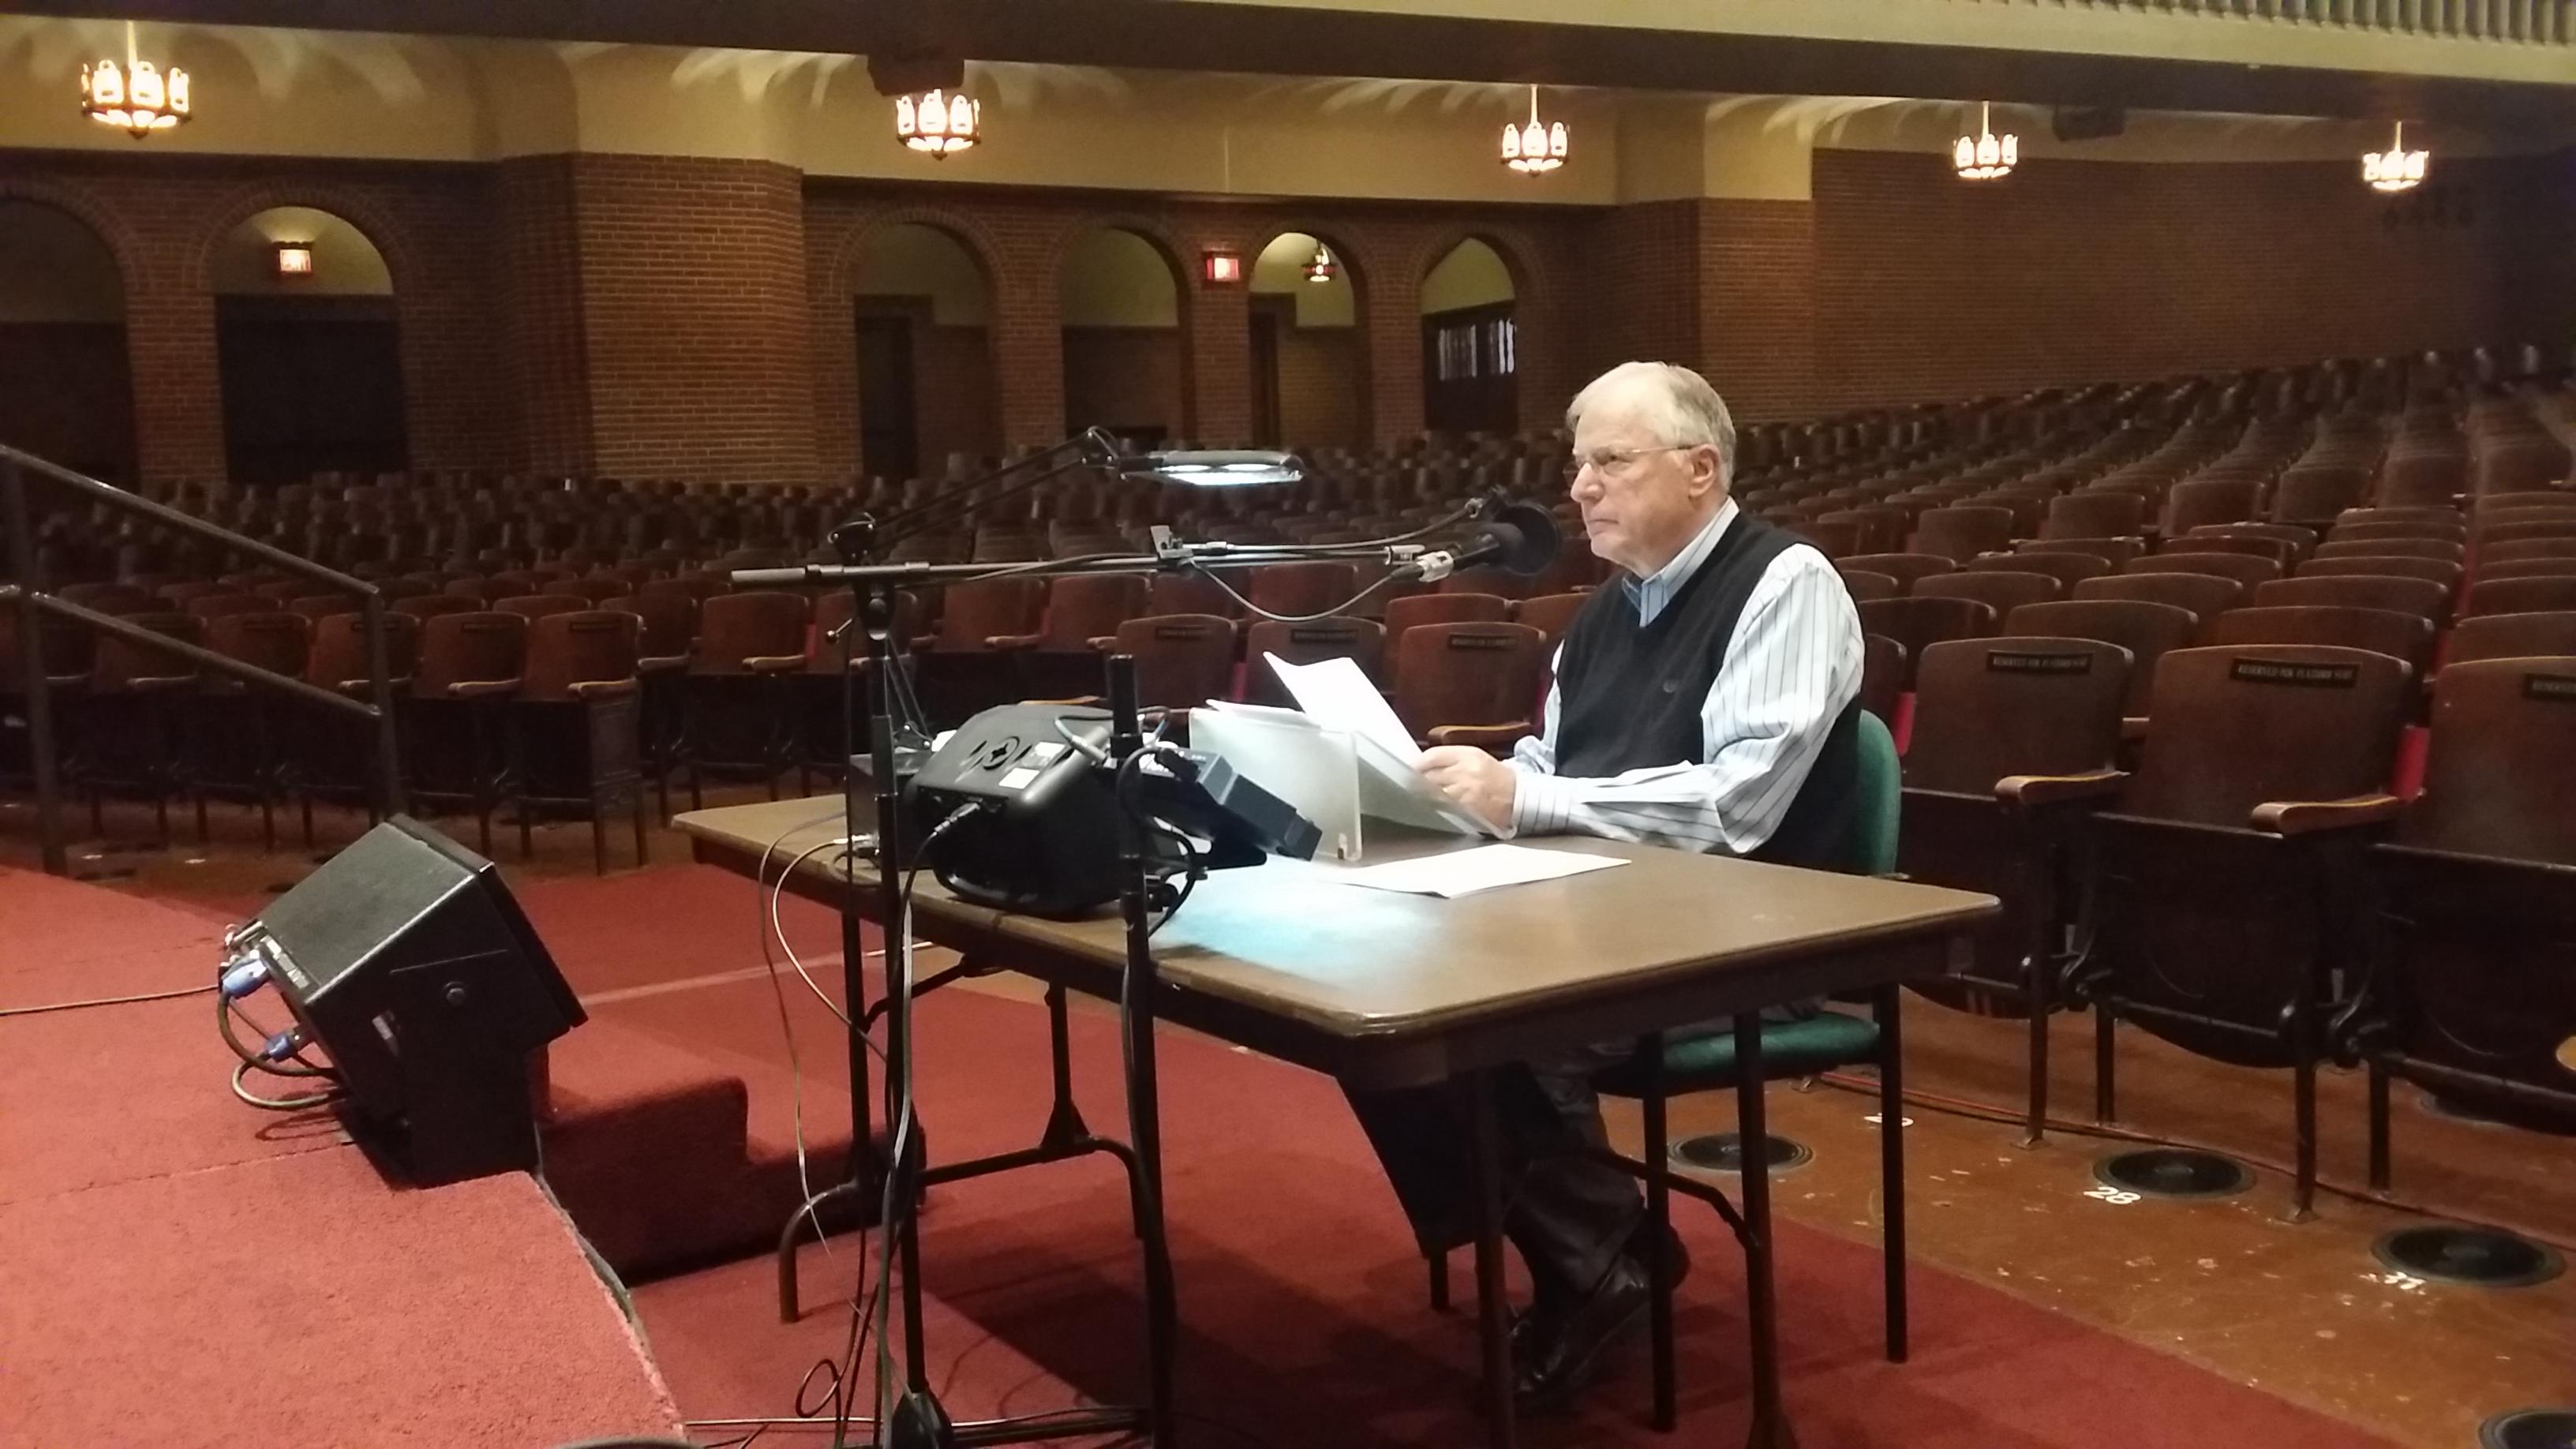 Dr. Lutzer recording